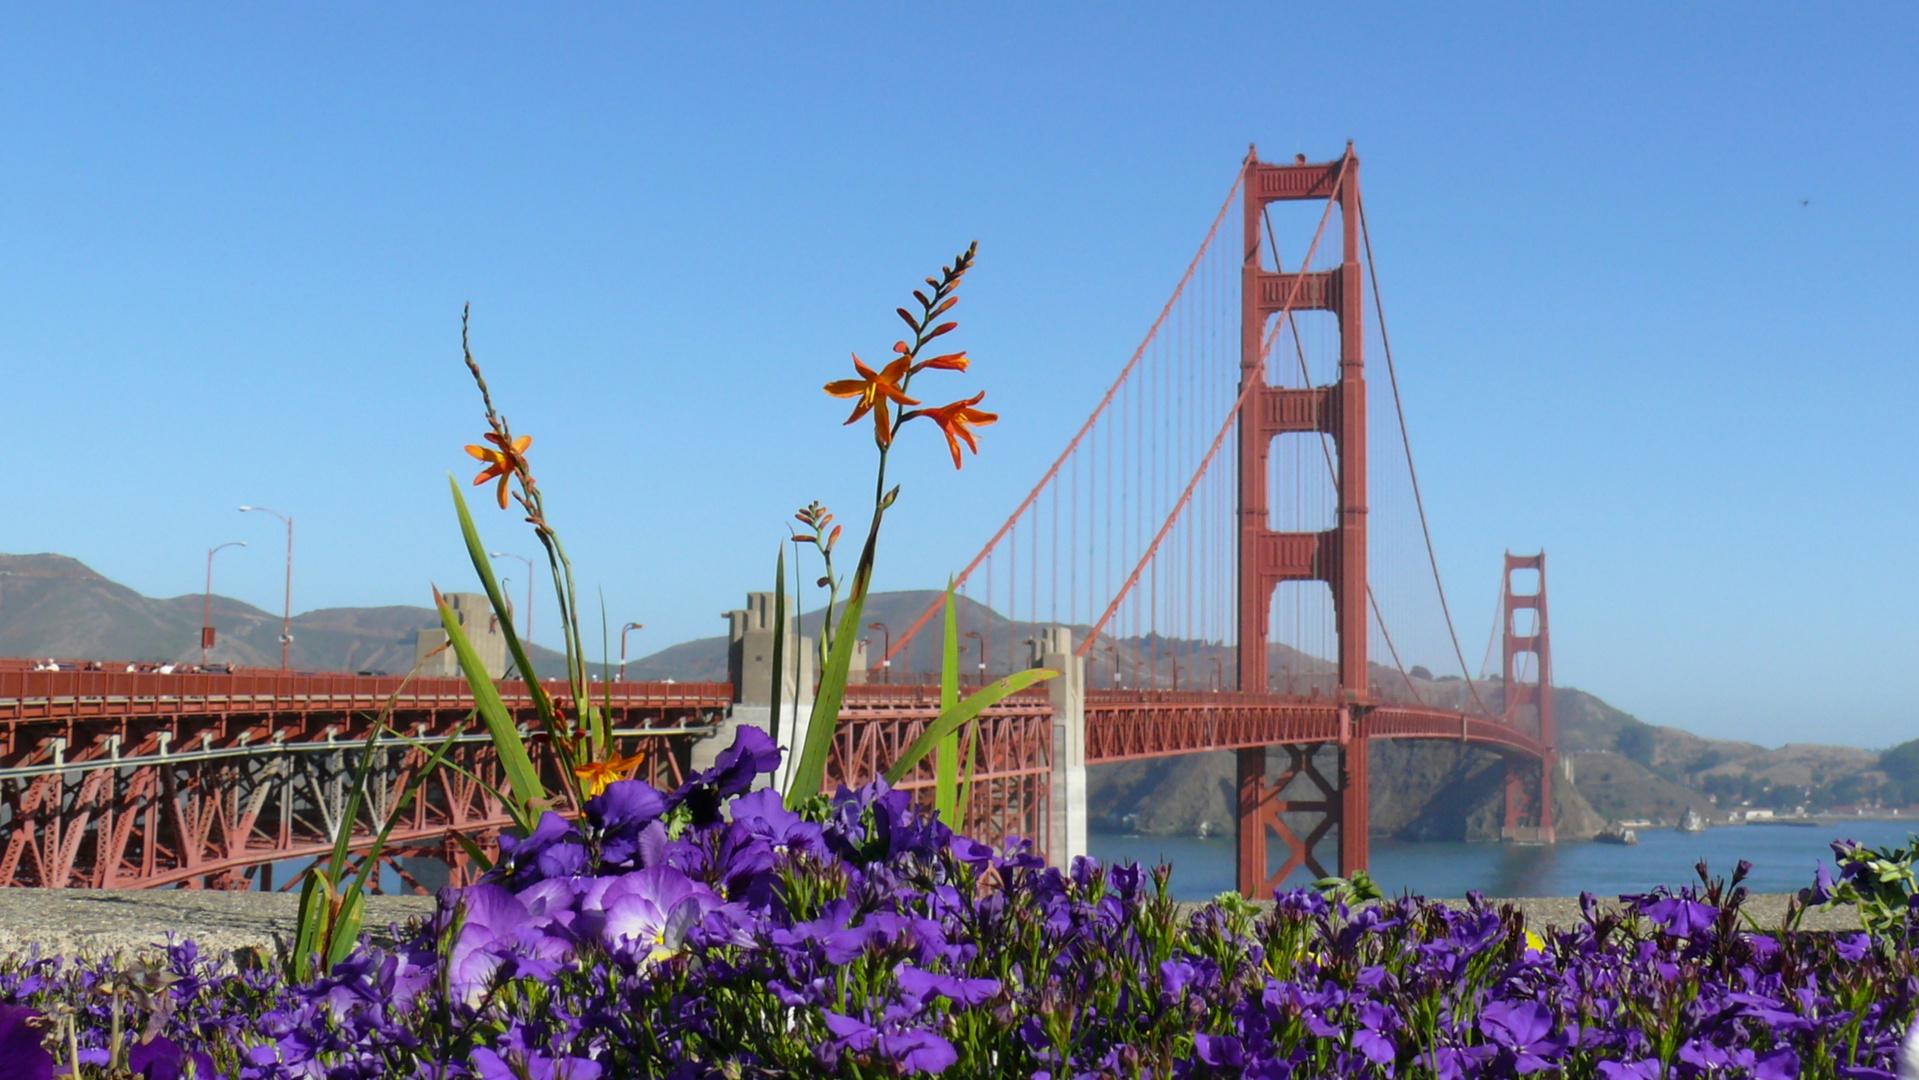 The Wonderful Golden Gate Bridge